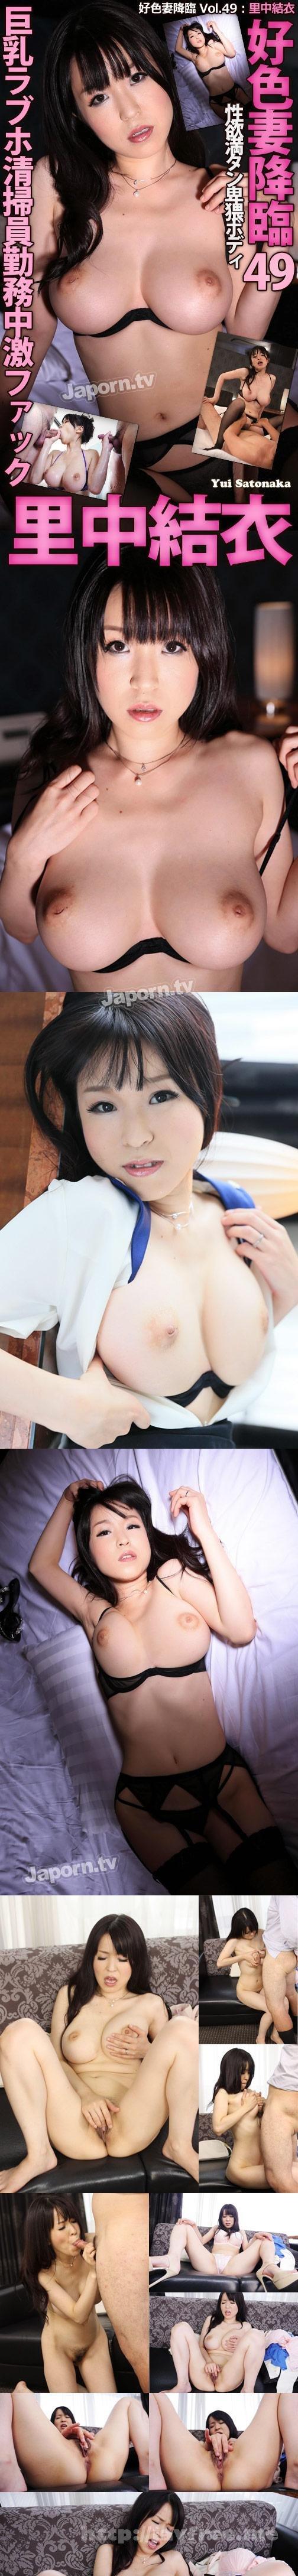 [SKY-308] 好色妻降臨 Vol.49 : 里中結衣 - image SKY-308_1 on https://javfree.me